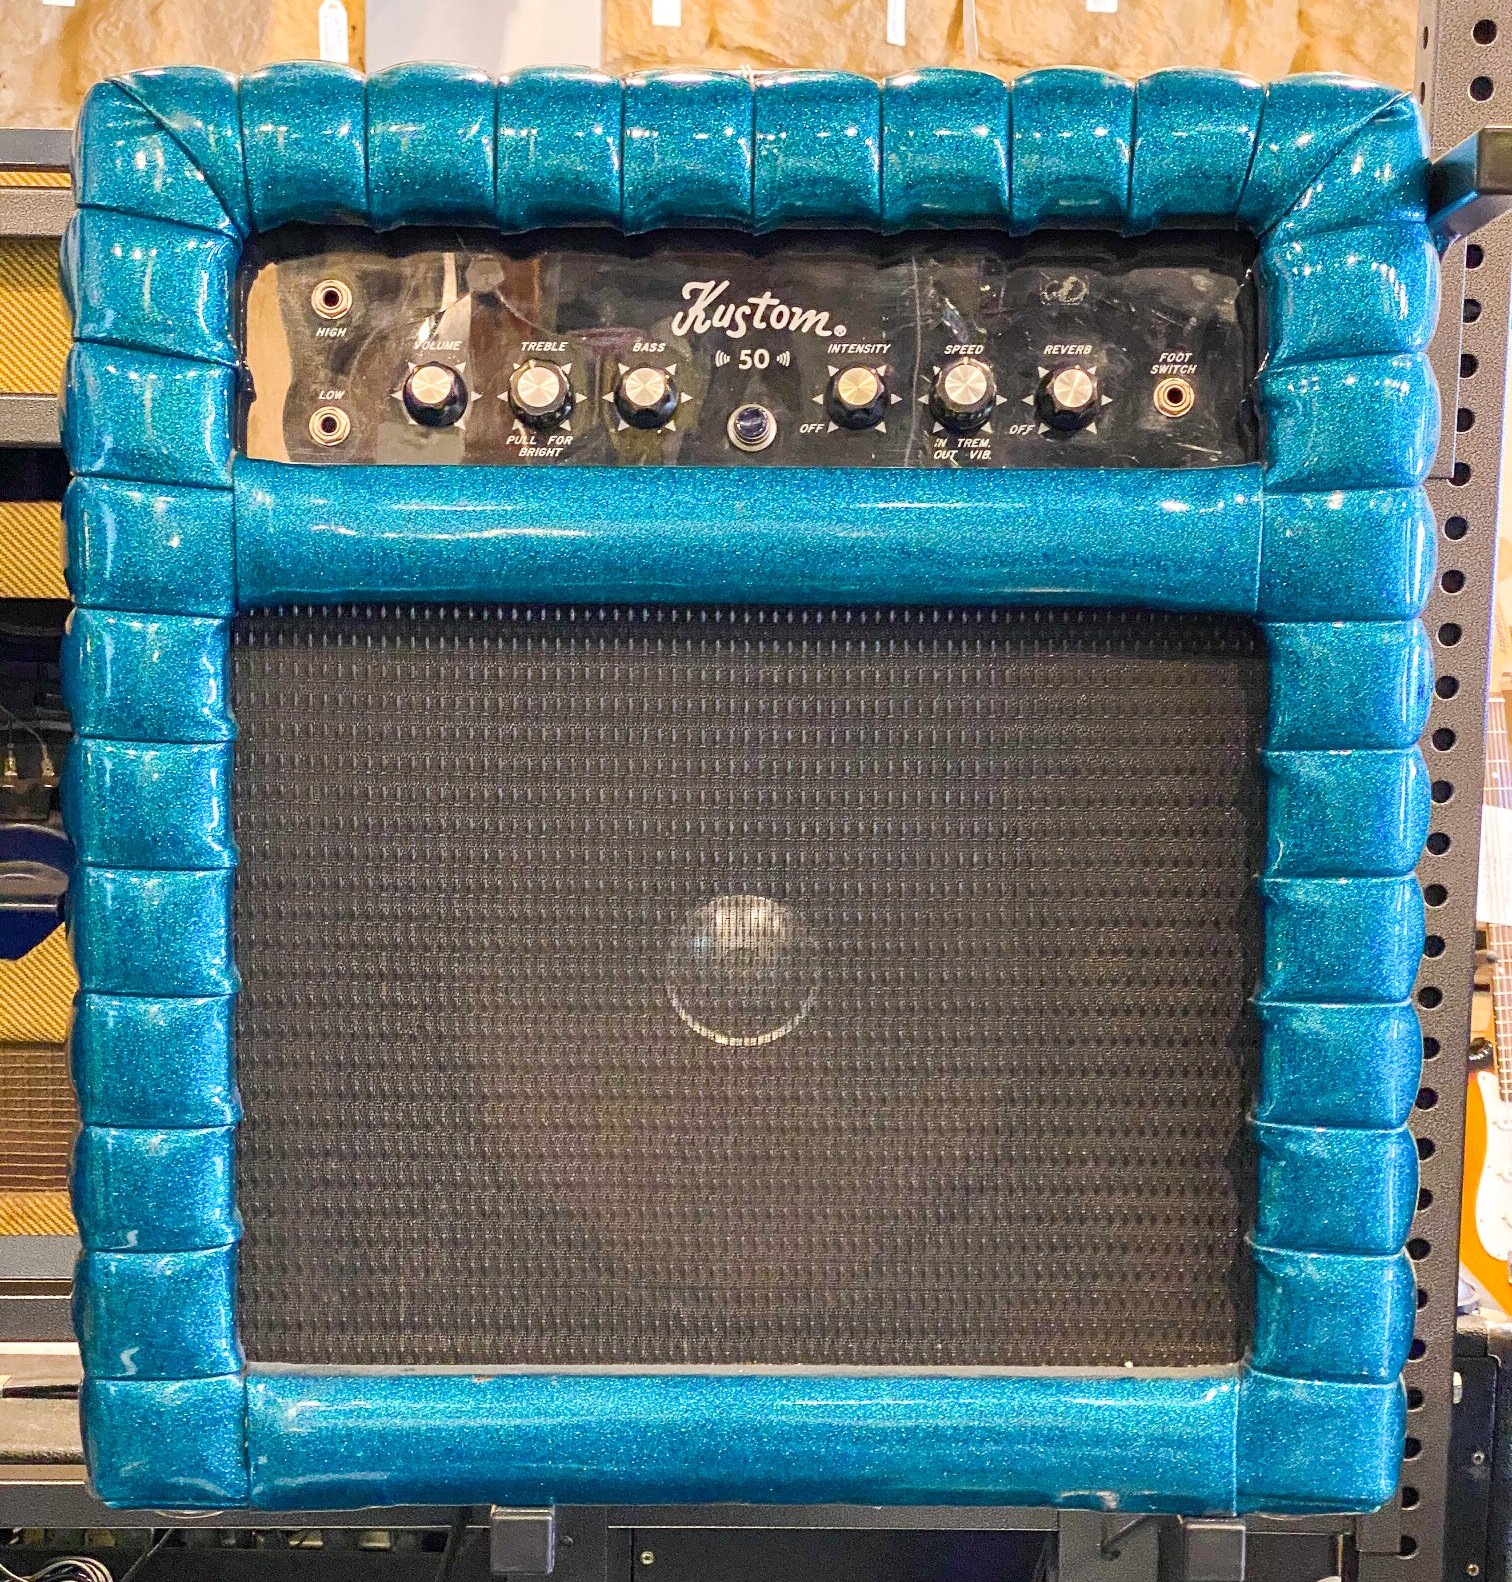 Vintage Kustom K50-2 combo amp